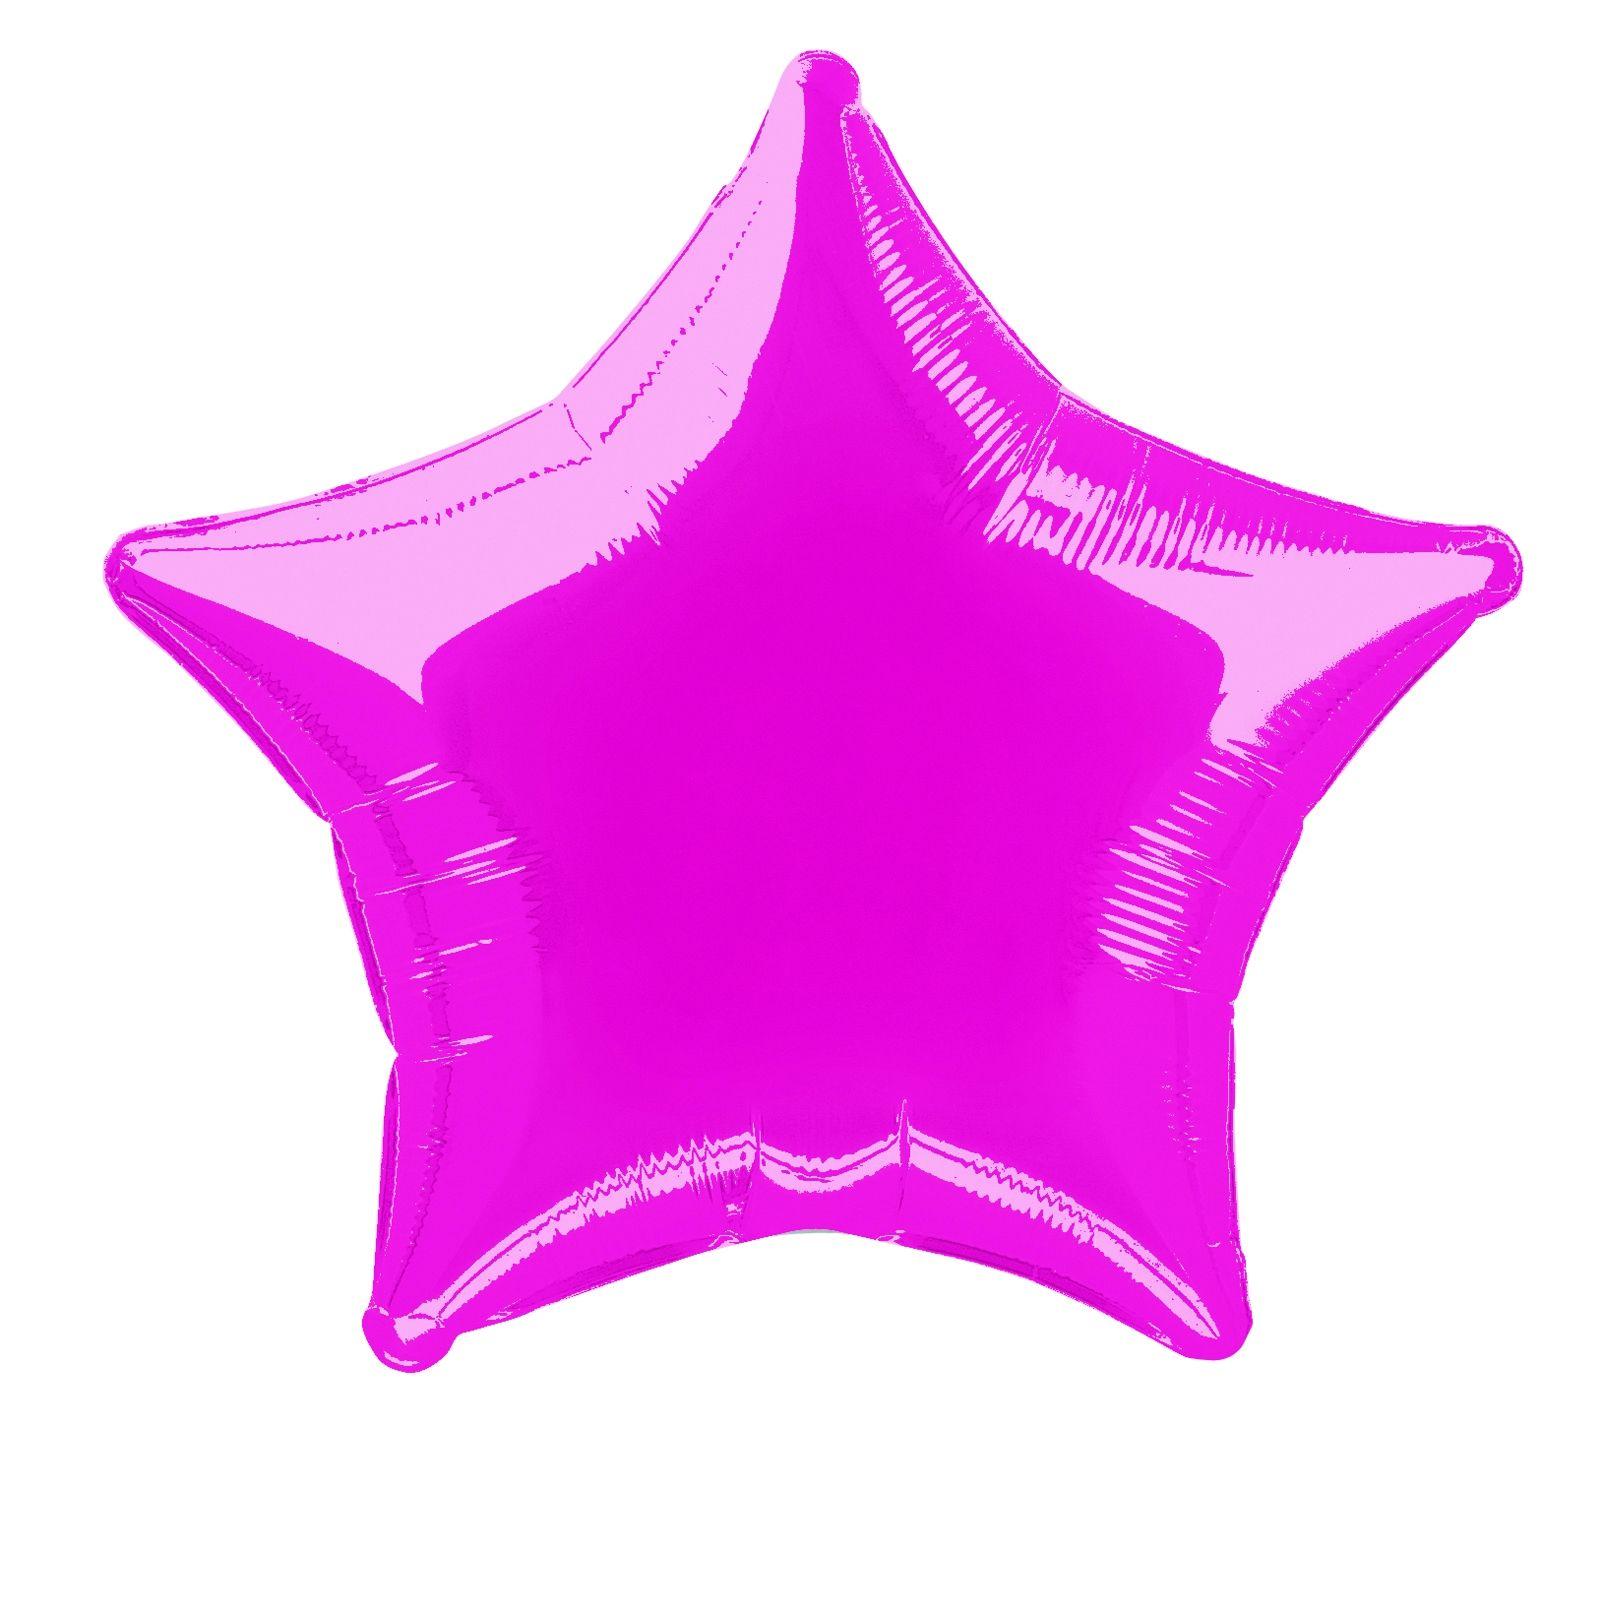 Metallic Hot Pink Star Shaped Foil Balloon